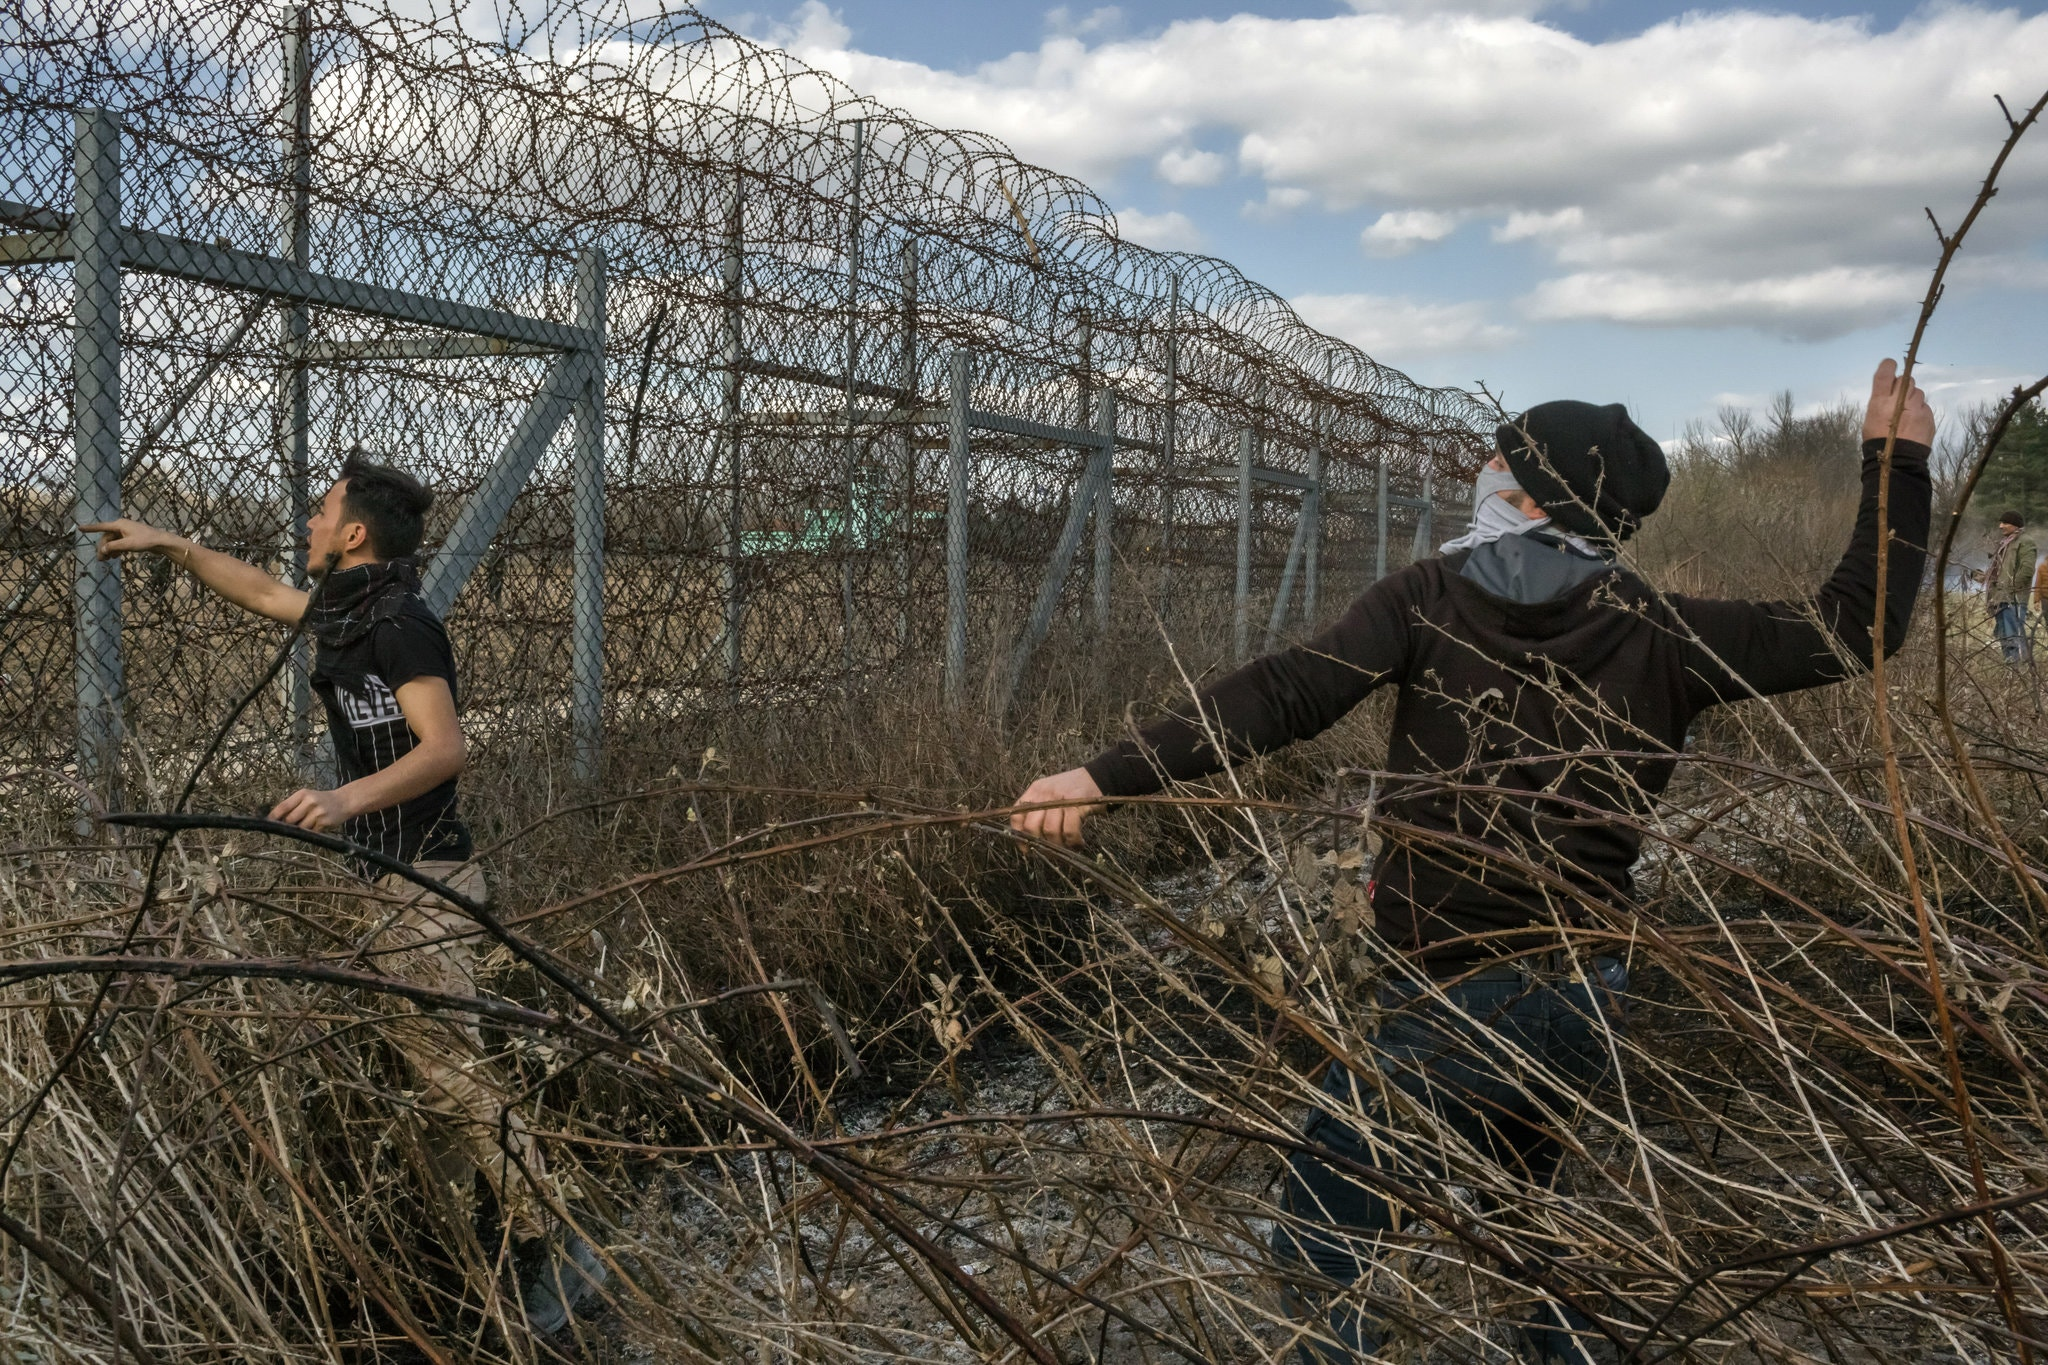 Turkey Steps Back From Confrontation at Greek Border